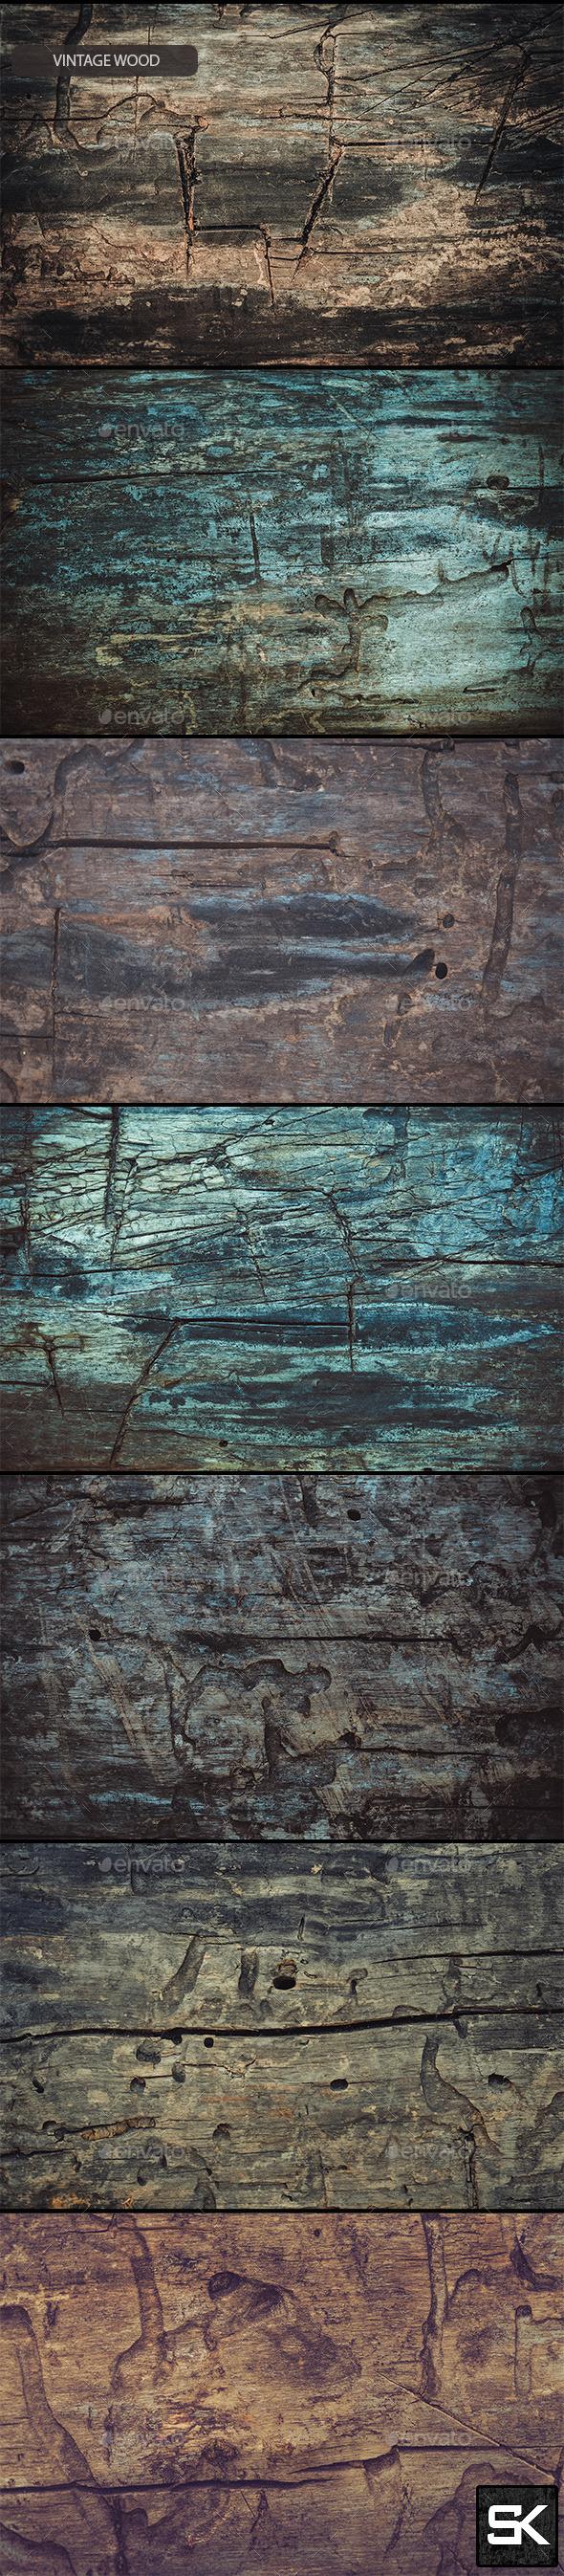 GraphicRiver Vintage Wood.4 11649225